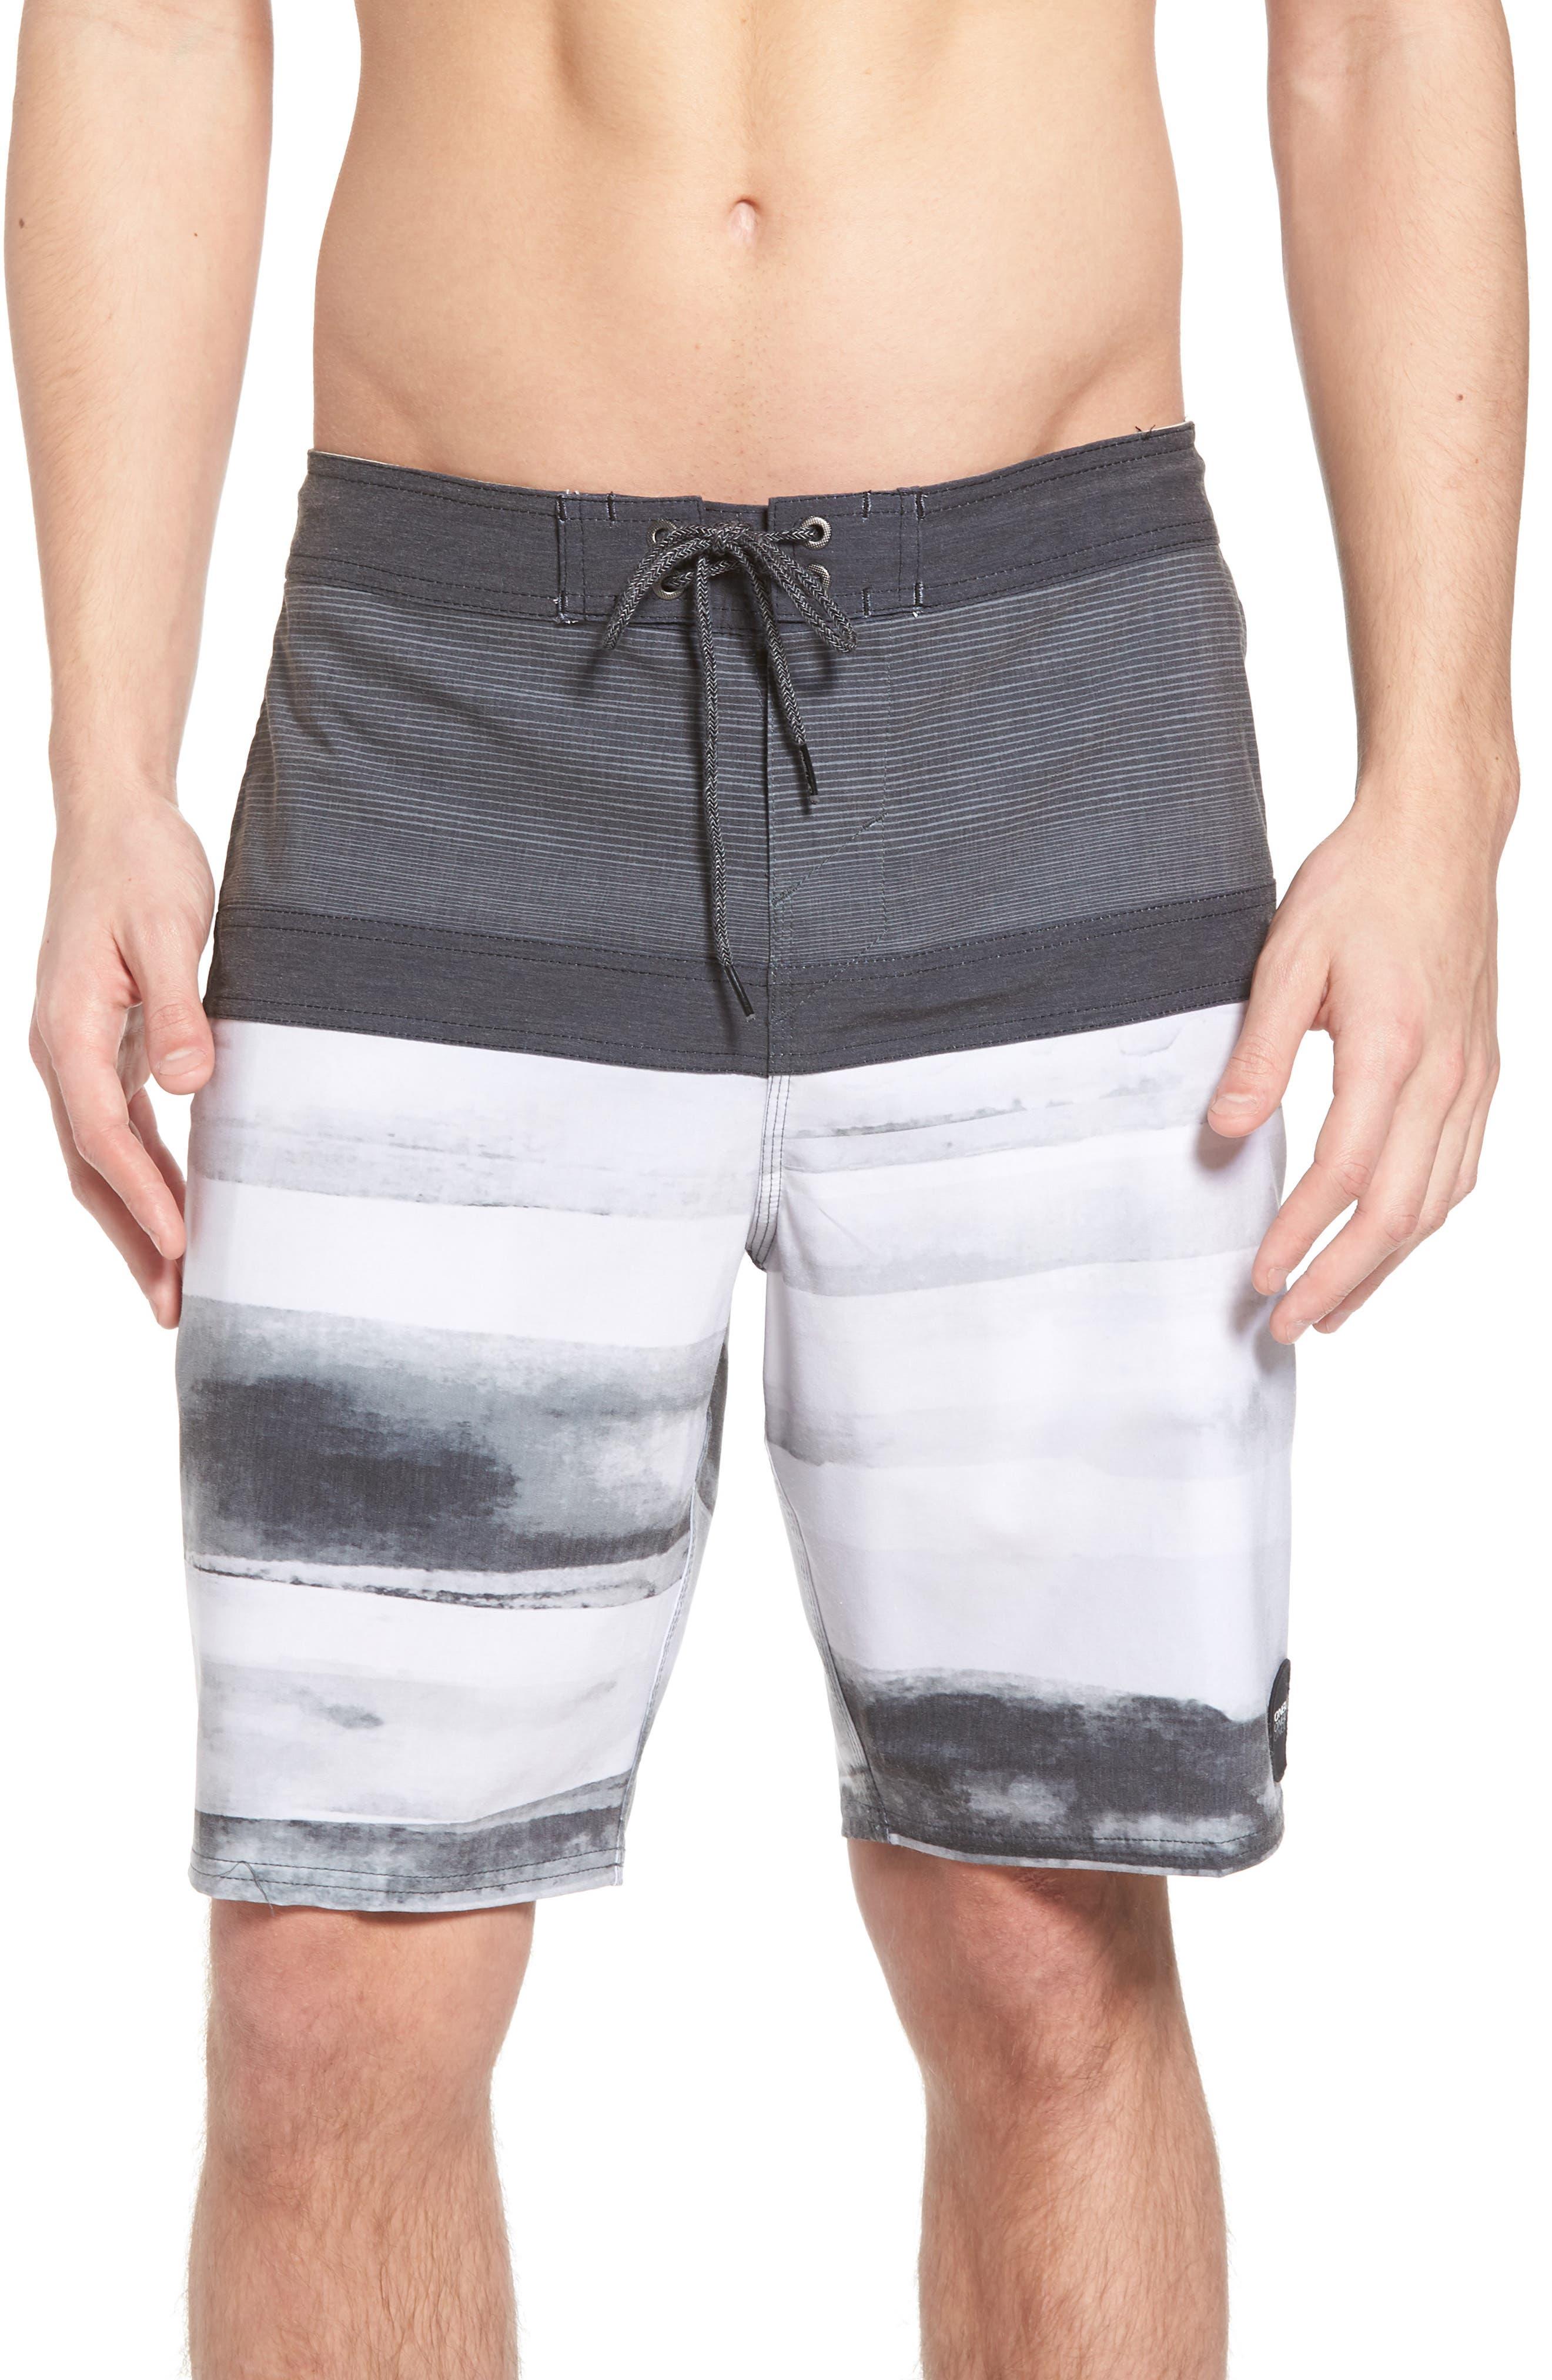 Breaker Cruzer Board Shorts,                             Main thumbnail 1, color,                             Black